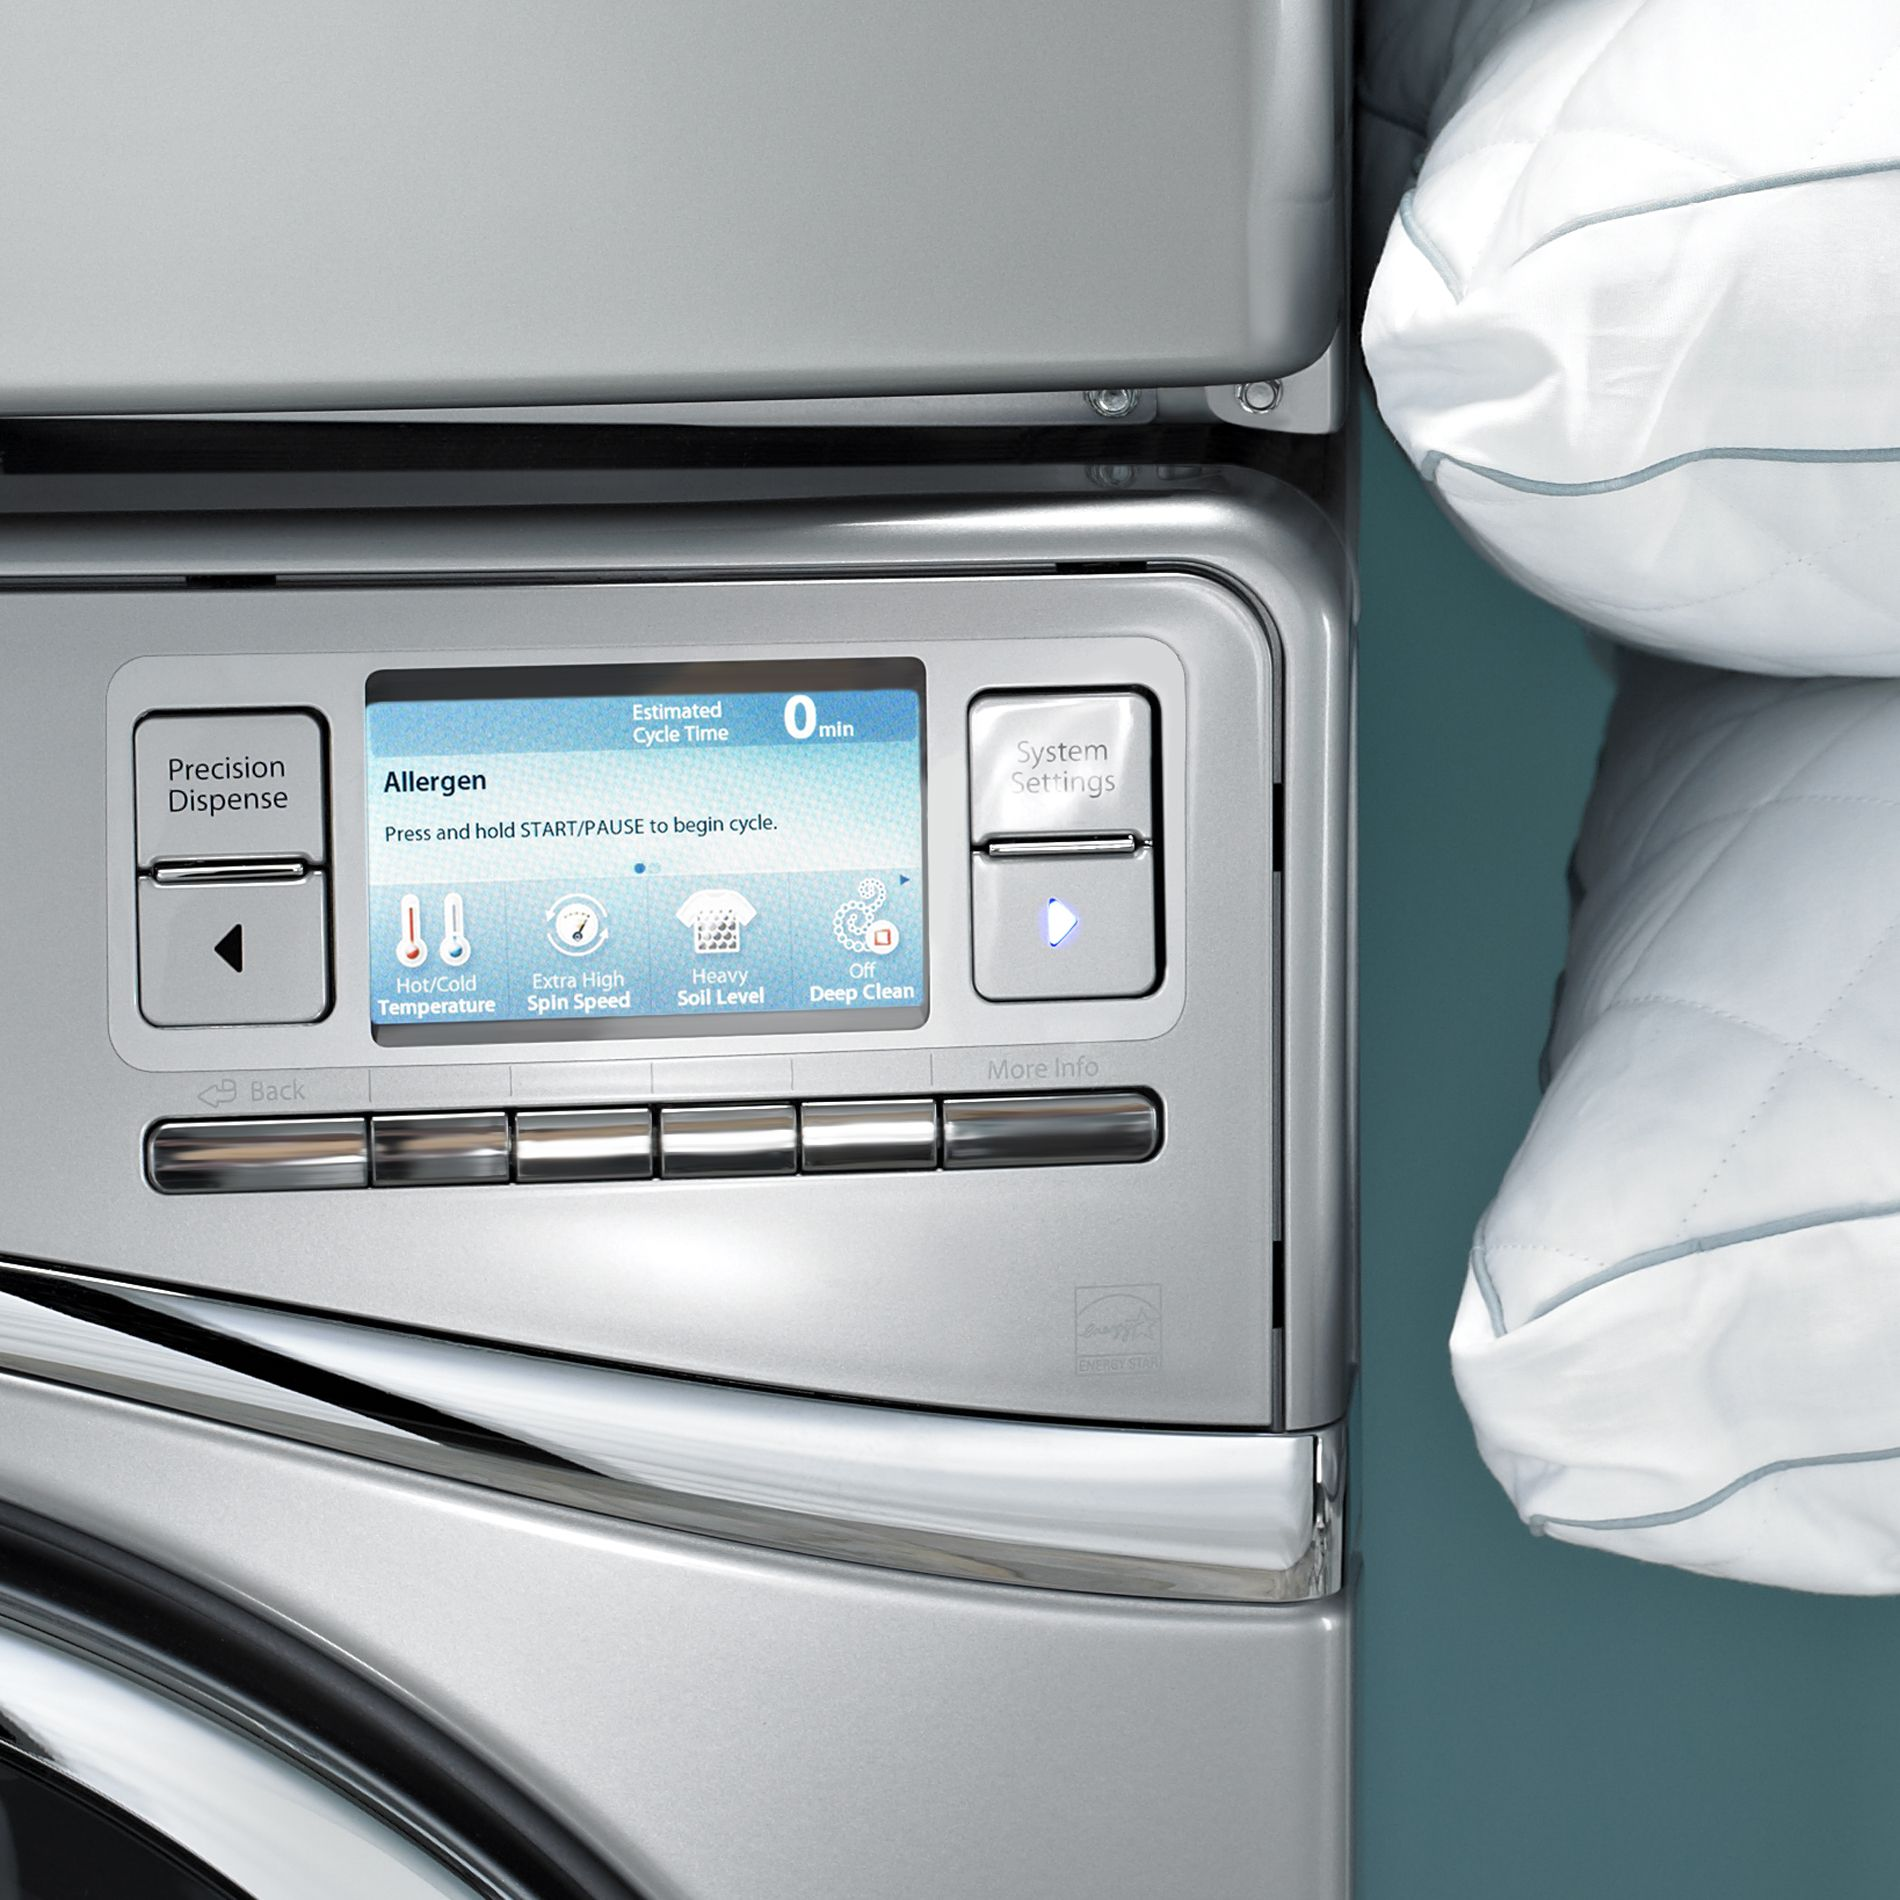 Whirlpool 7.4 cu. ft. Gas Dryer